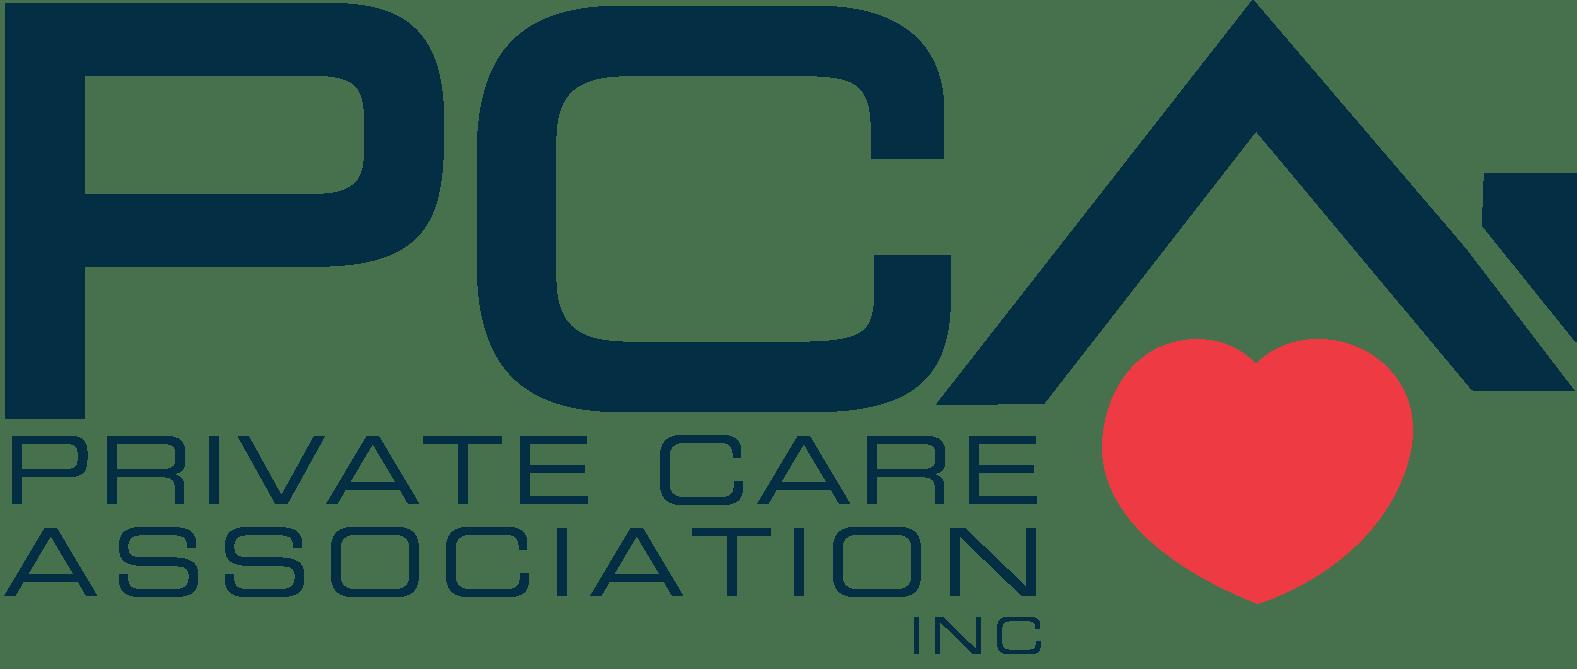 Private Care Association